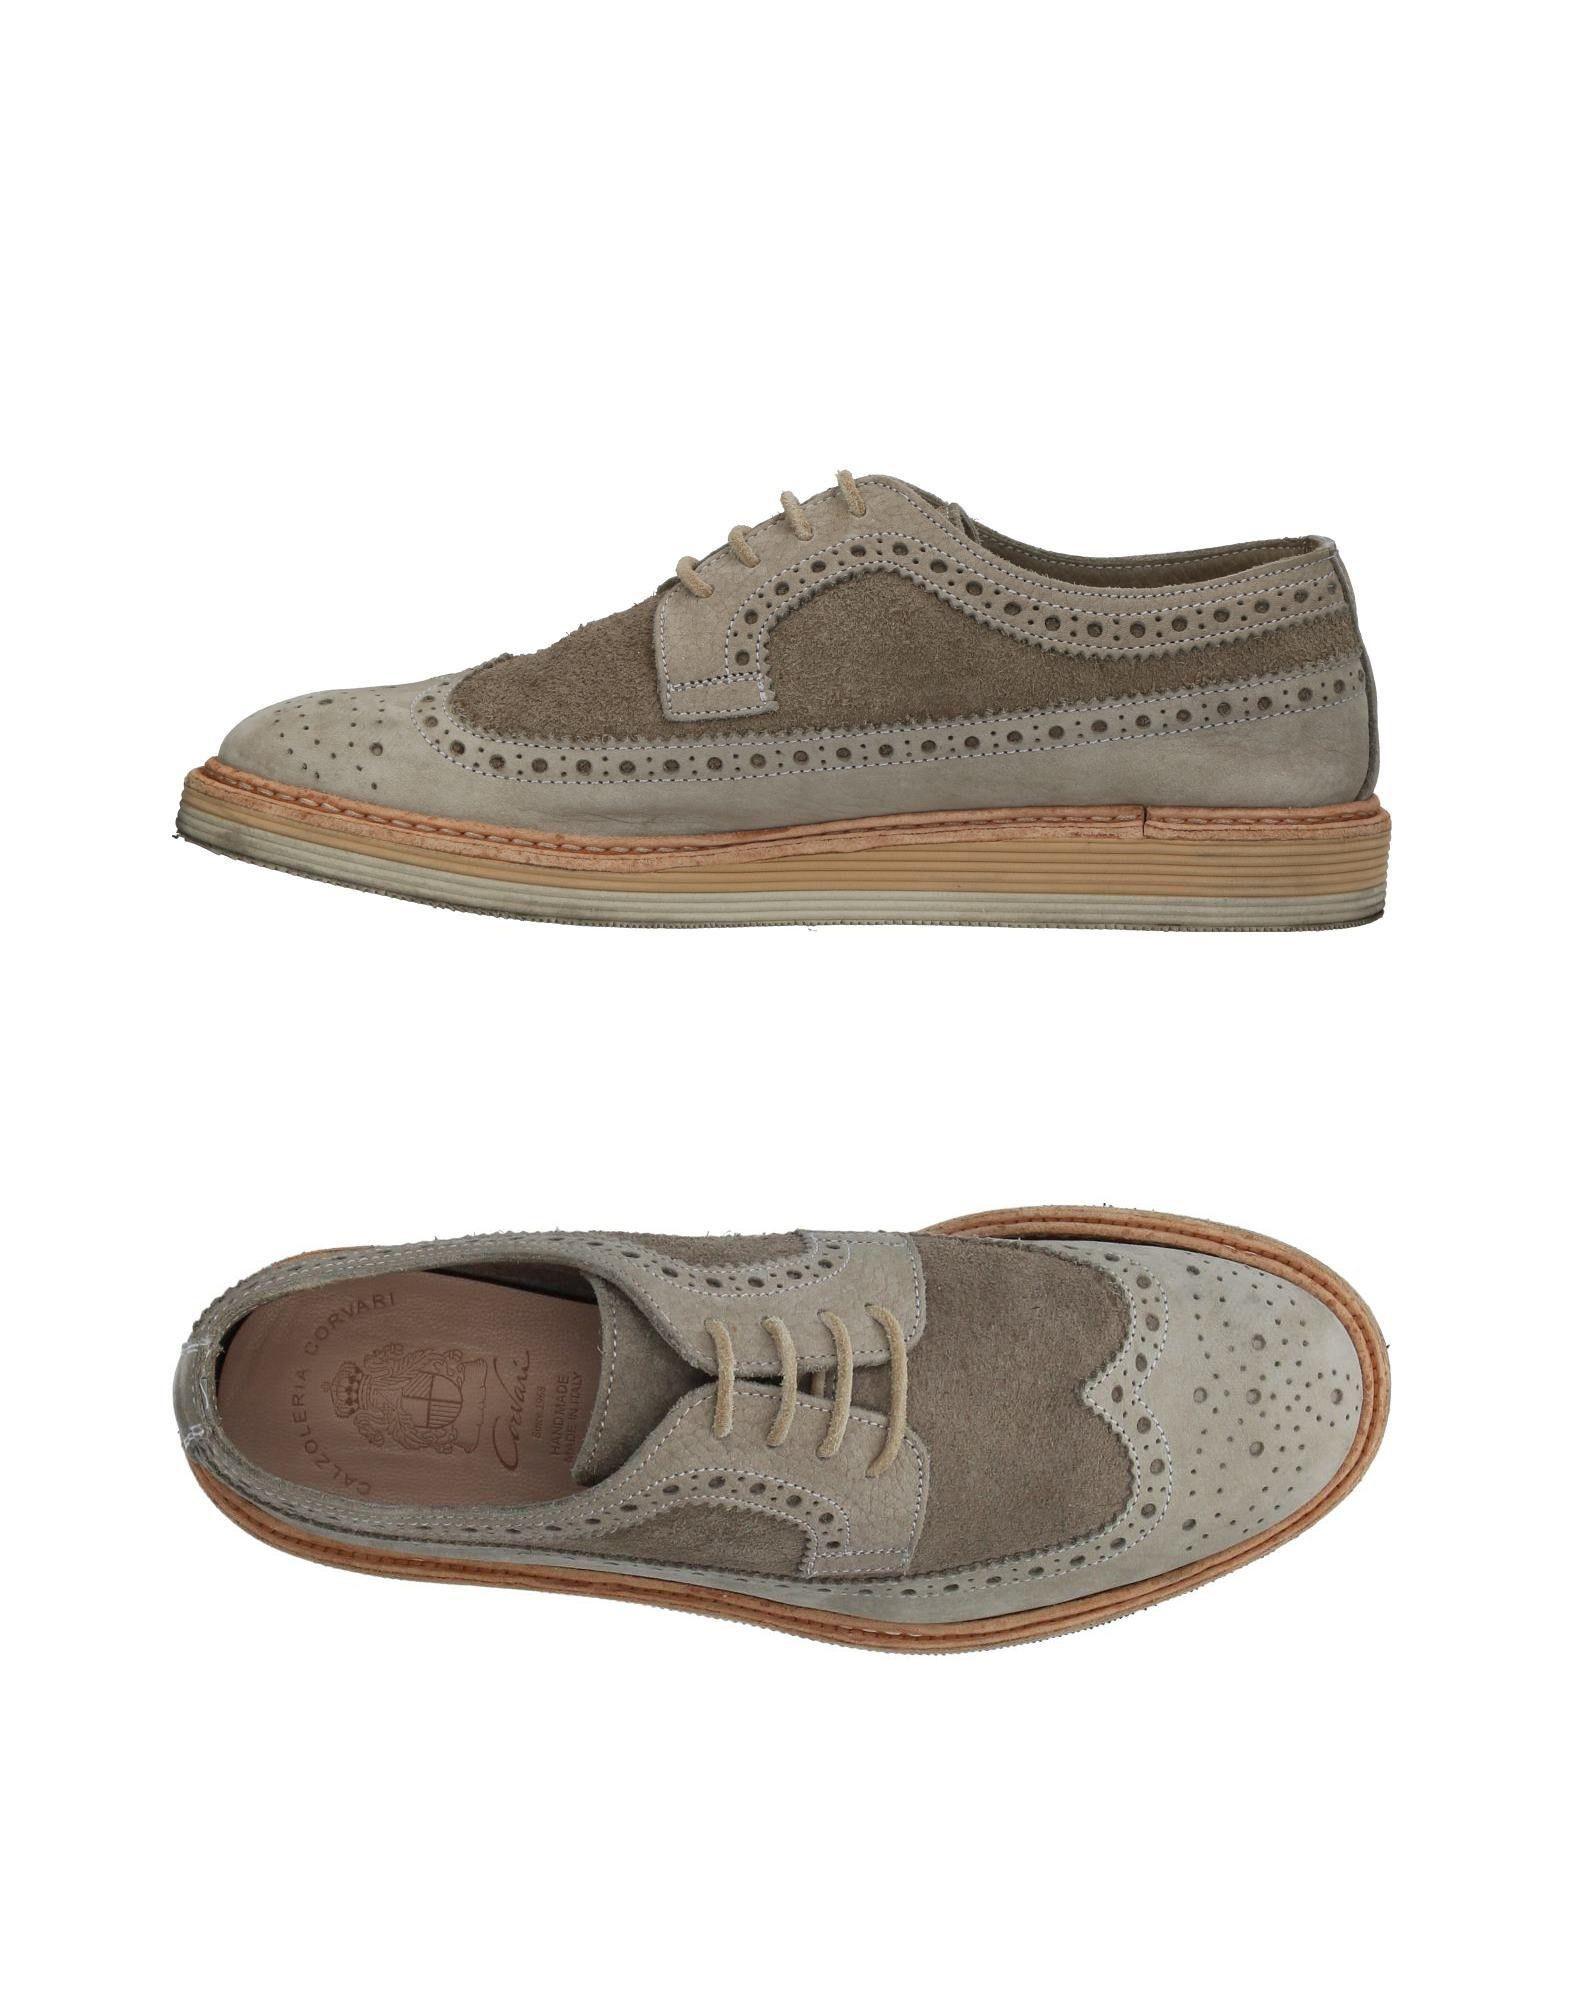 Allongez-out - Chaussures Pour Hommes / Lacets Noirs Clarks FfYPXail